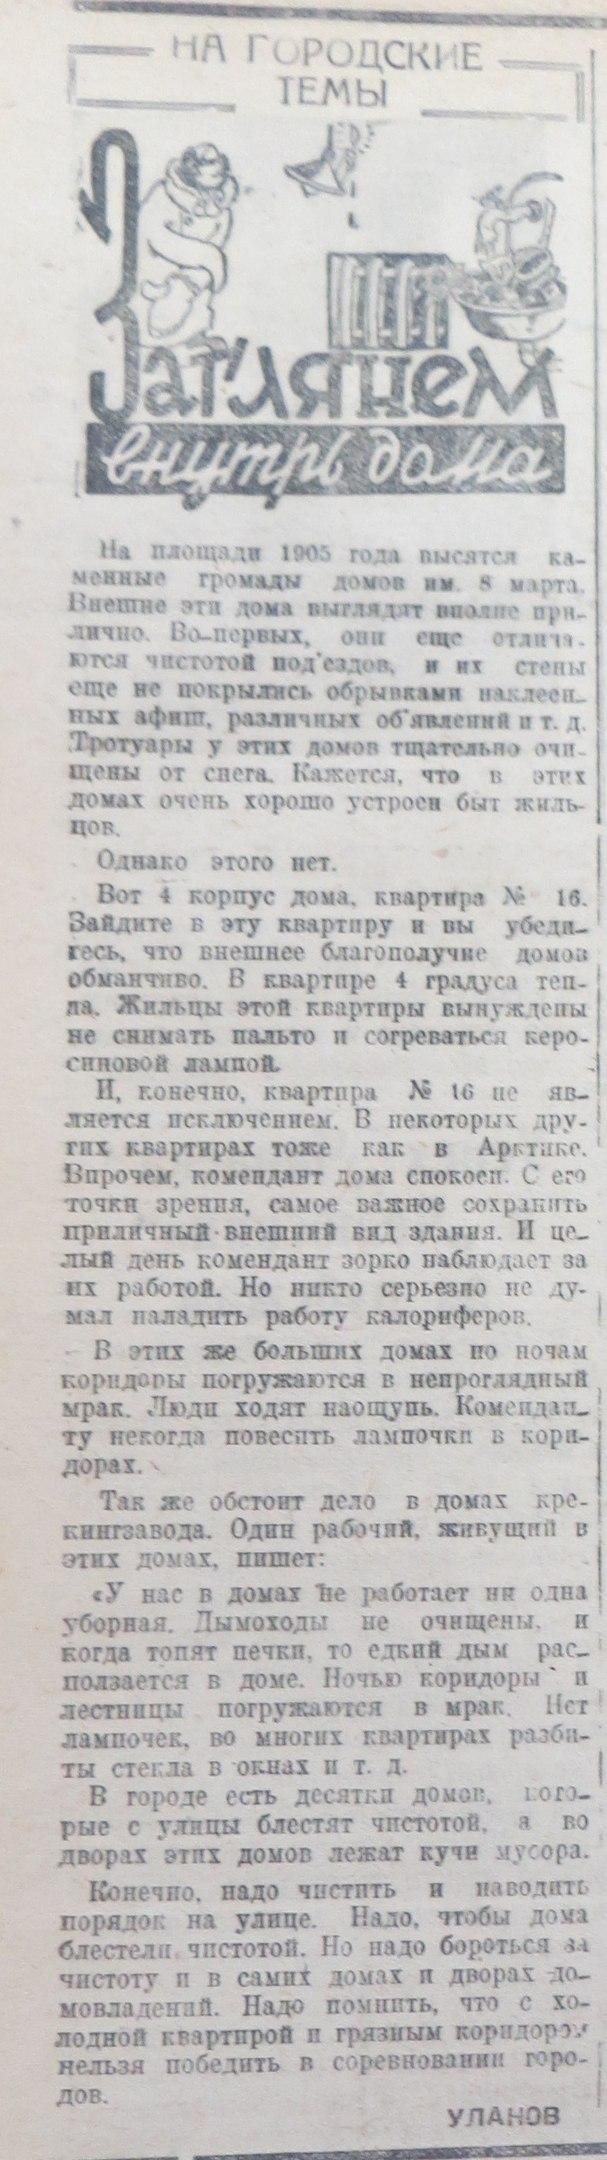 1934-12-22 дома 8 марта недоделки.jpg